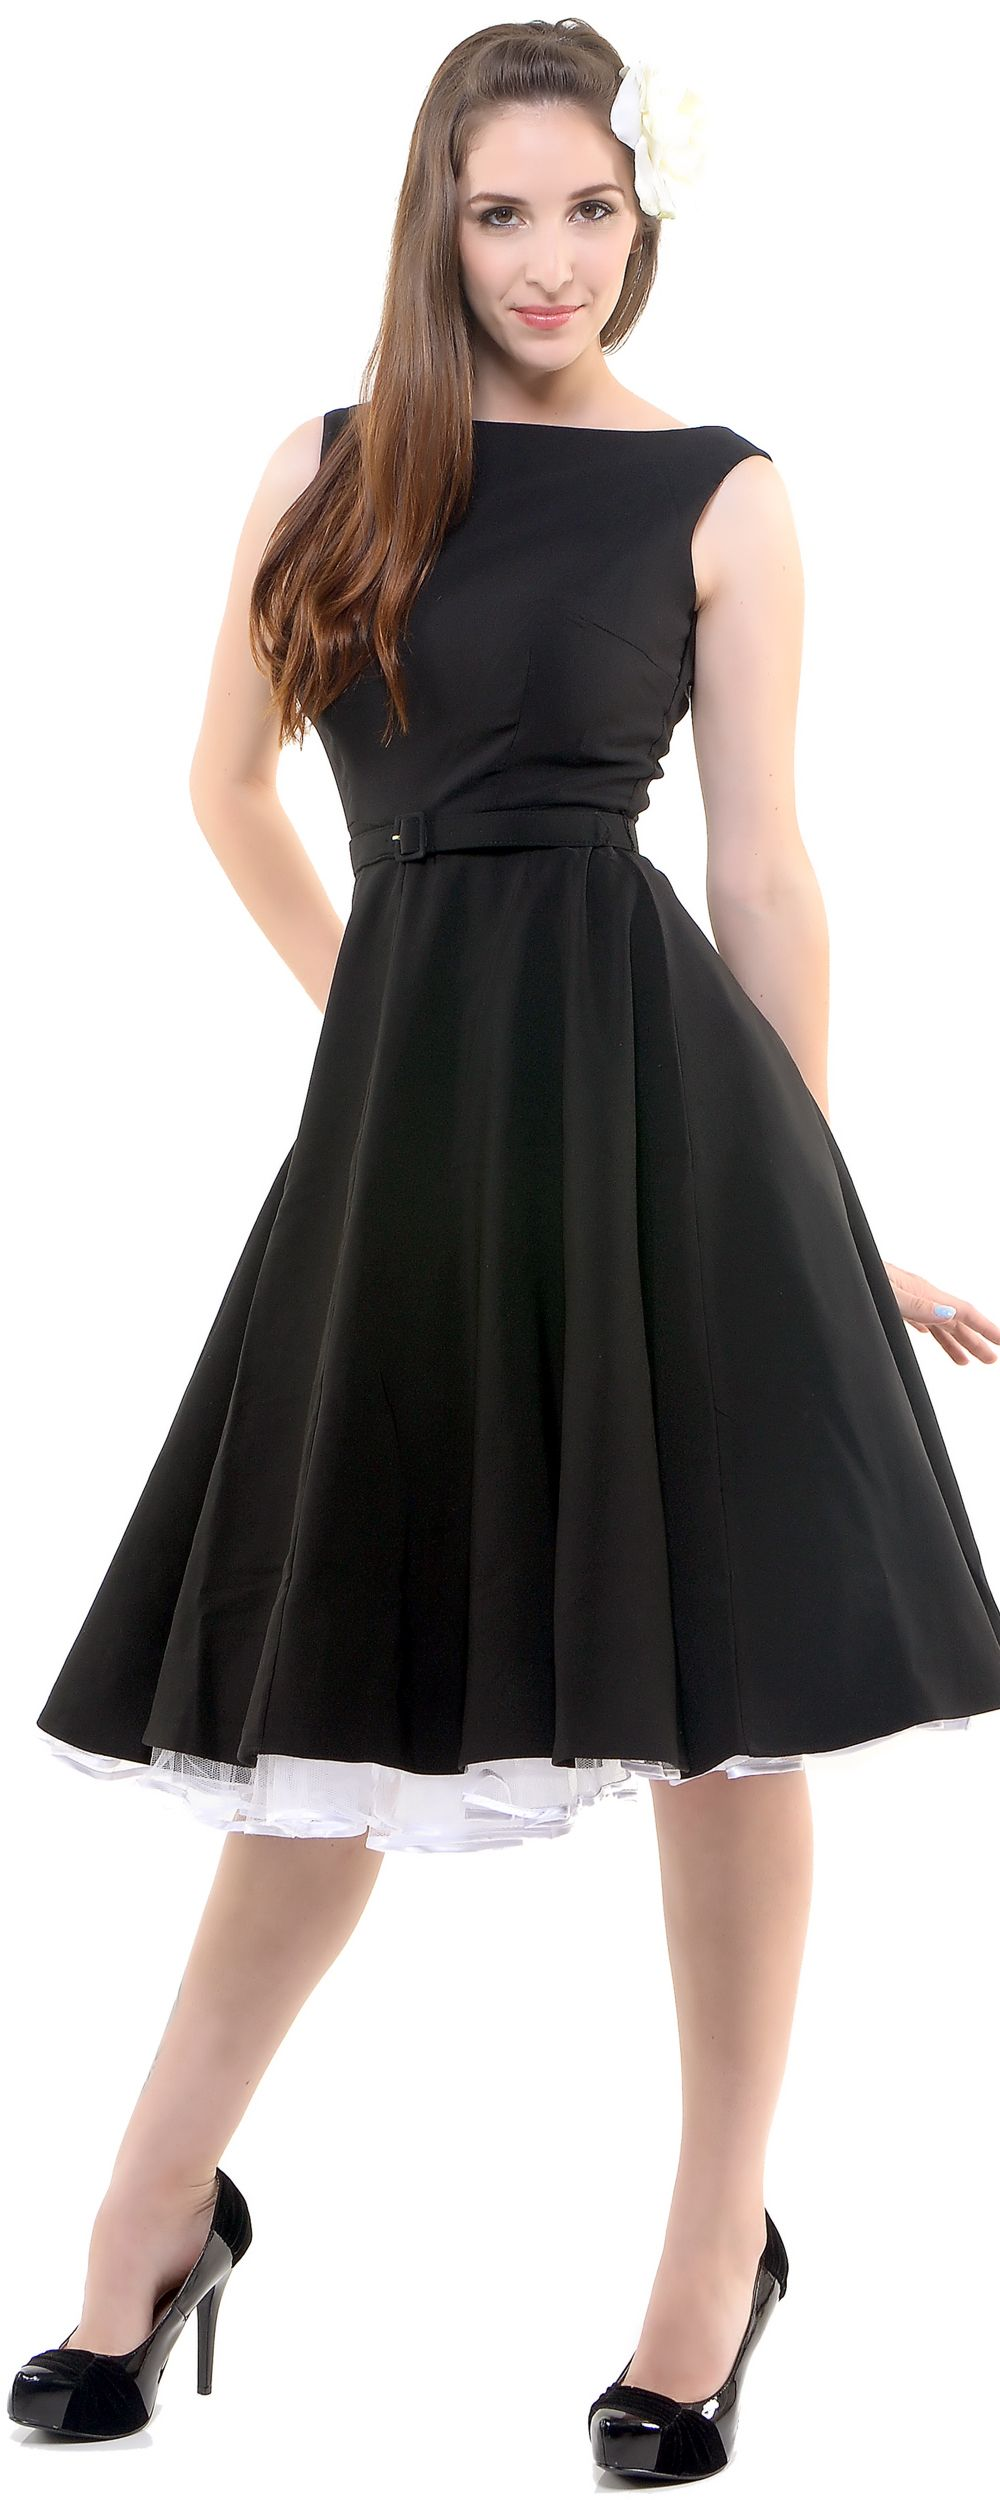 SALE! Black Jazmin Circle Skirt Swing Dress - Unique Vintage - Prom dresses, retro dresses, retro swimsuits.